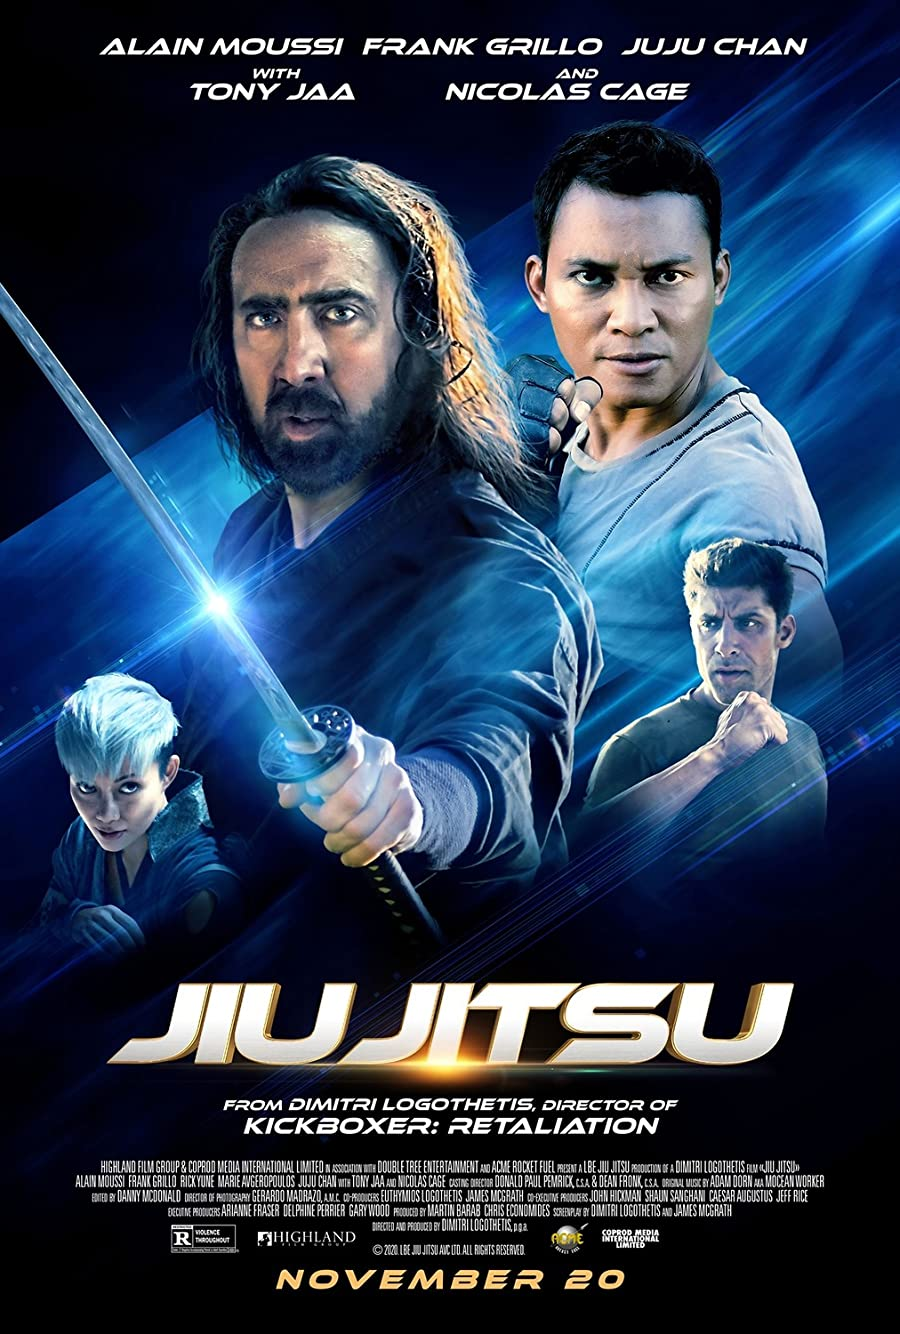 دانلود فیلم جیو جیتسو دوبله فارسی Jiu Jitsu 2020